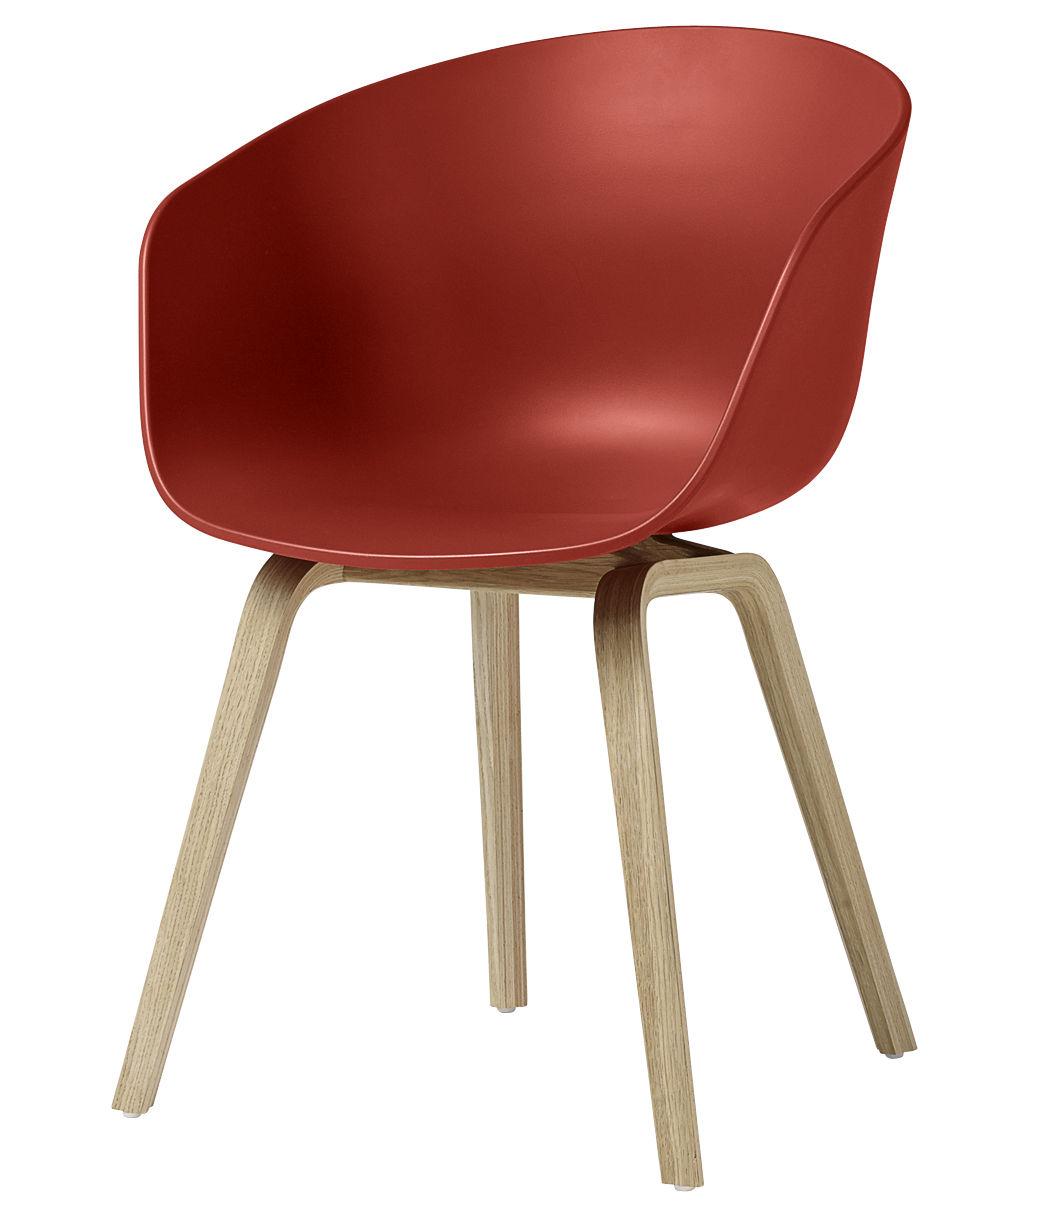 about a chair aac22 kunststoff stuhlbeine aus holz hay sessel. Black Bedroom Furniture Sets. Home Design Ideas